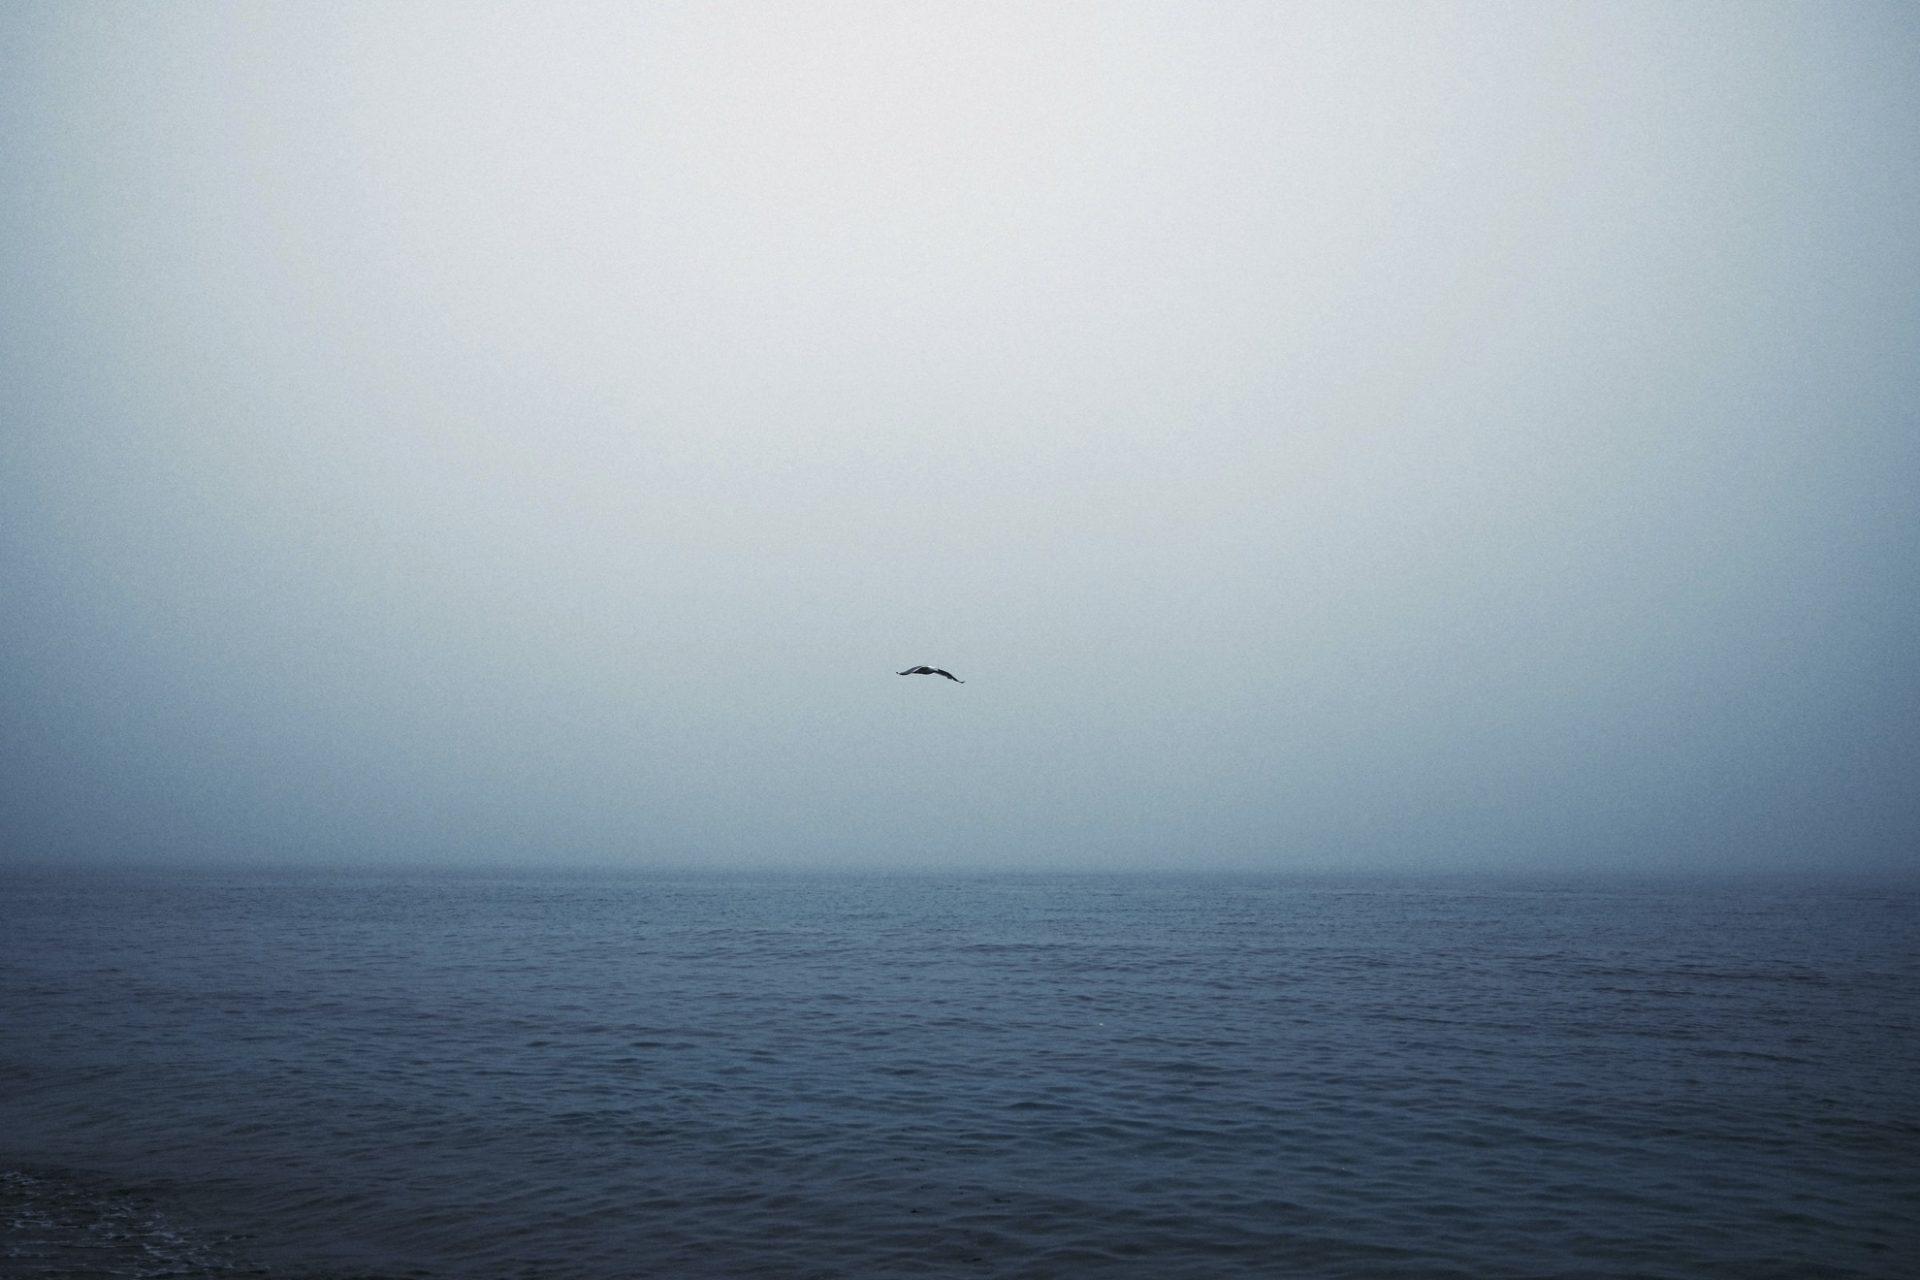 Fuji X100v pin de galle fog @laurentparienti-9